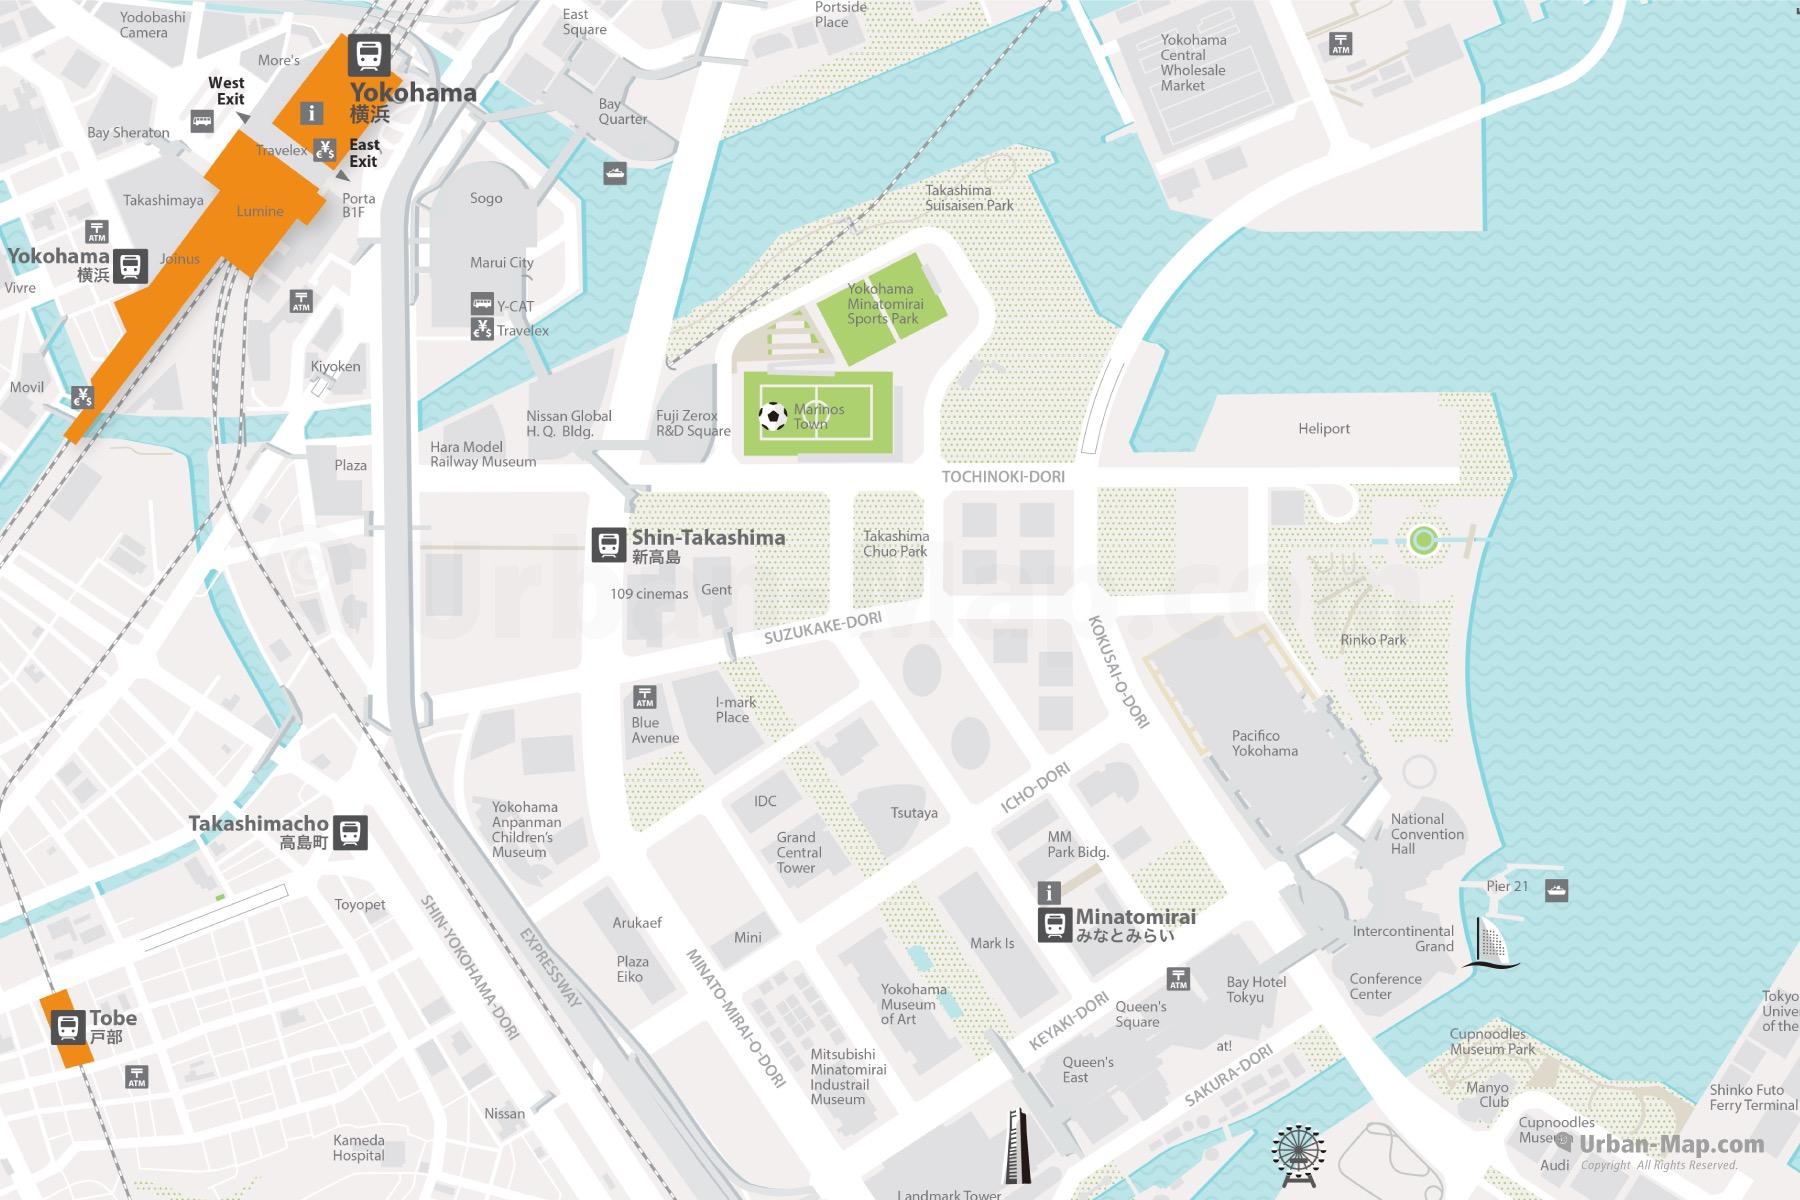 Yokohama Area City Map shows the Yokohama Station